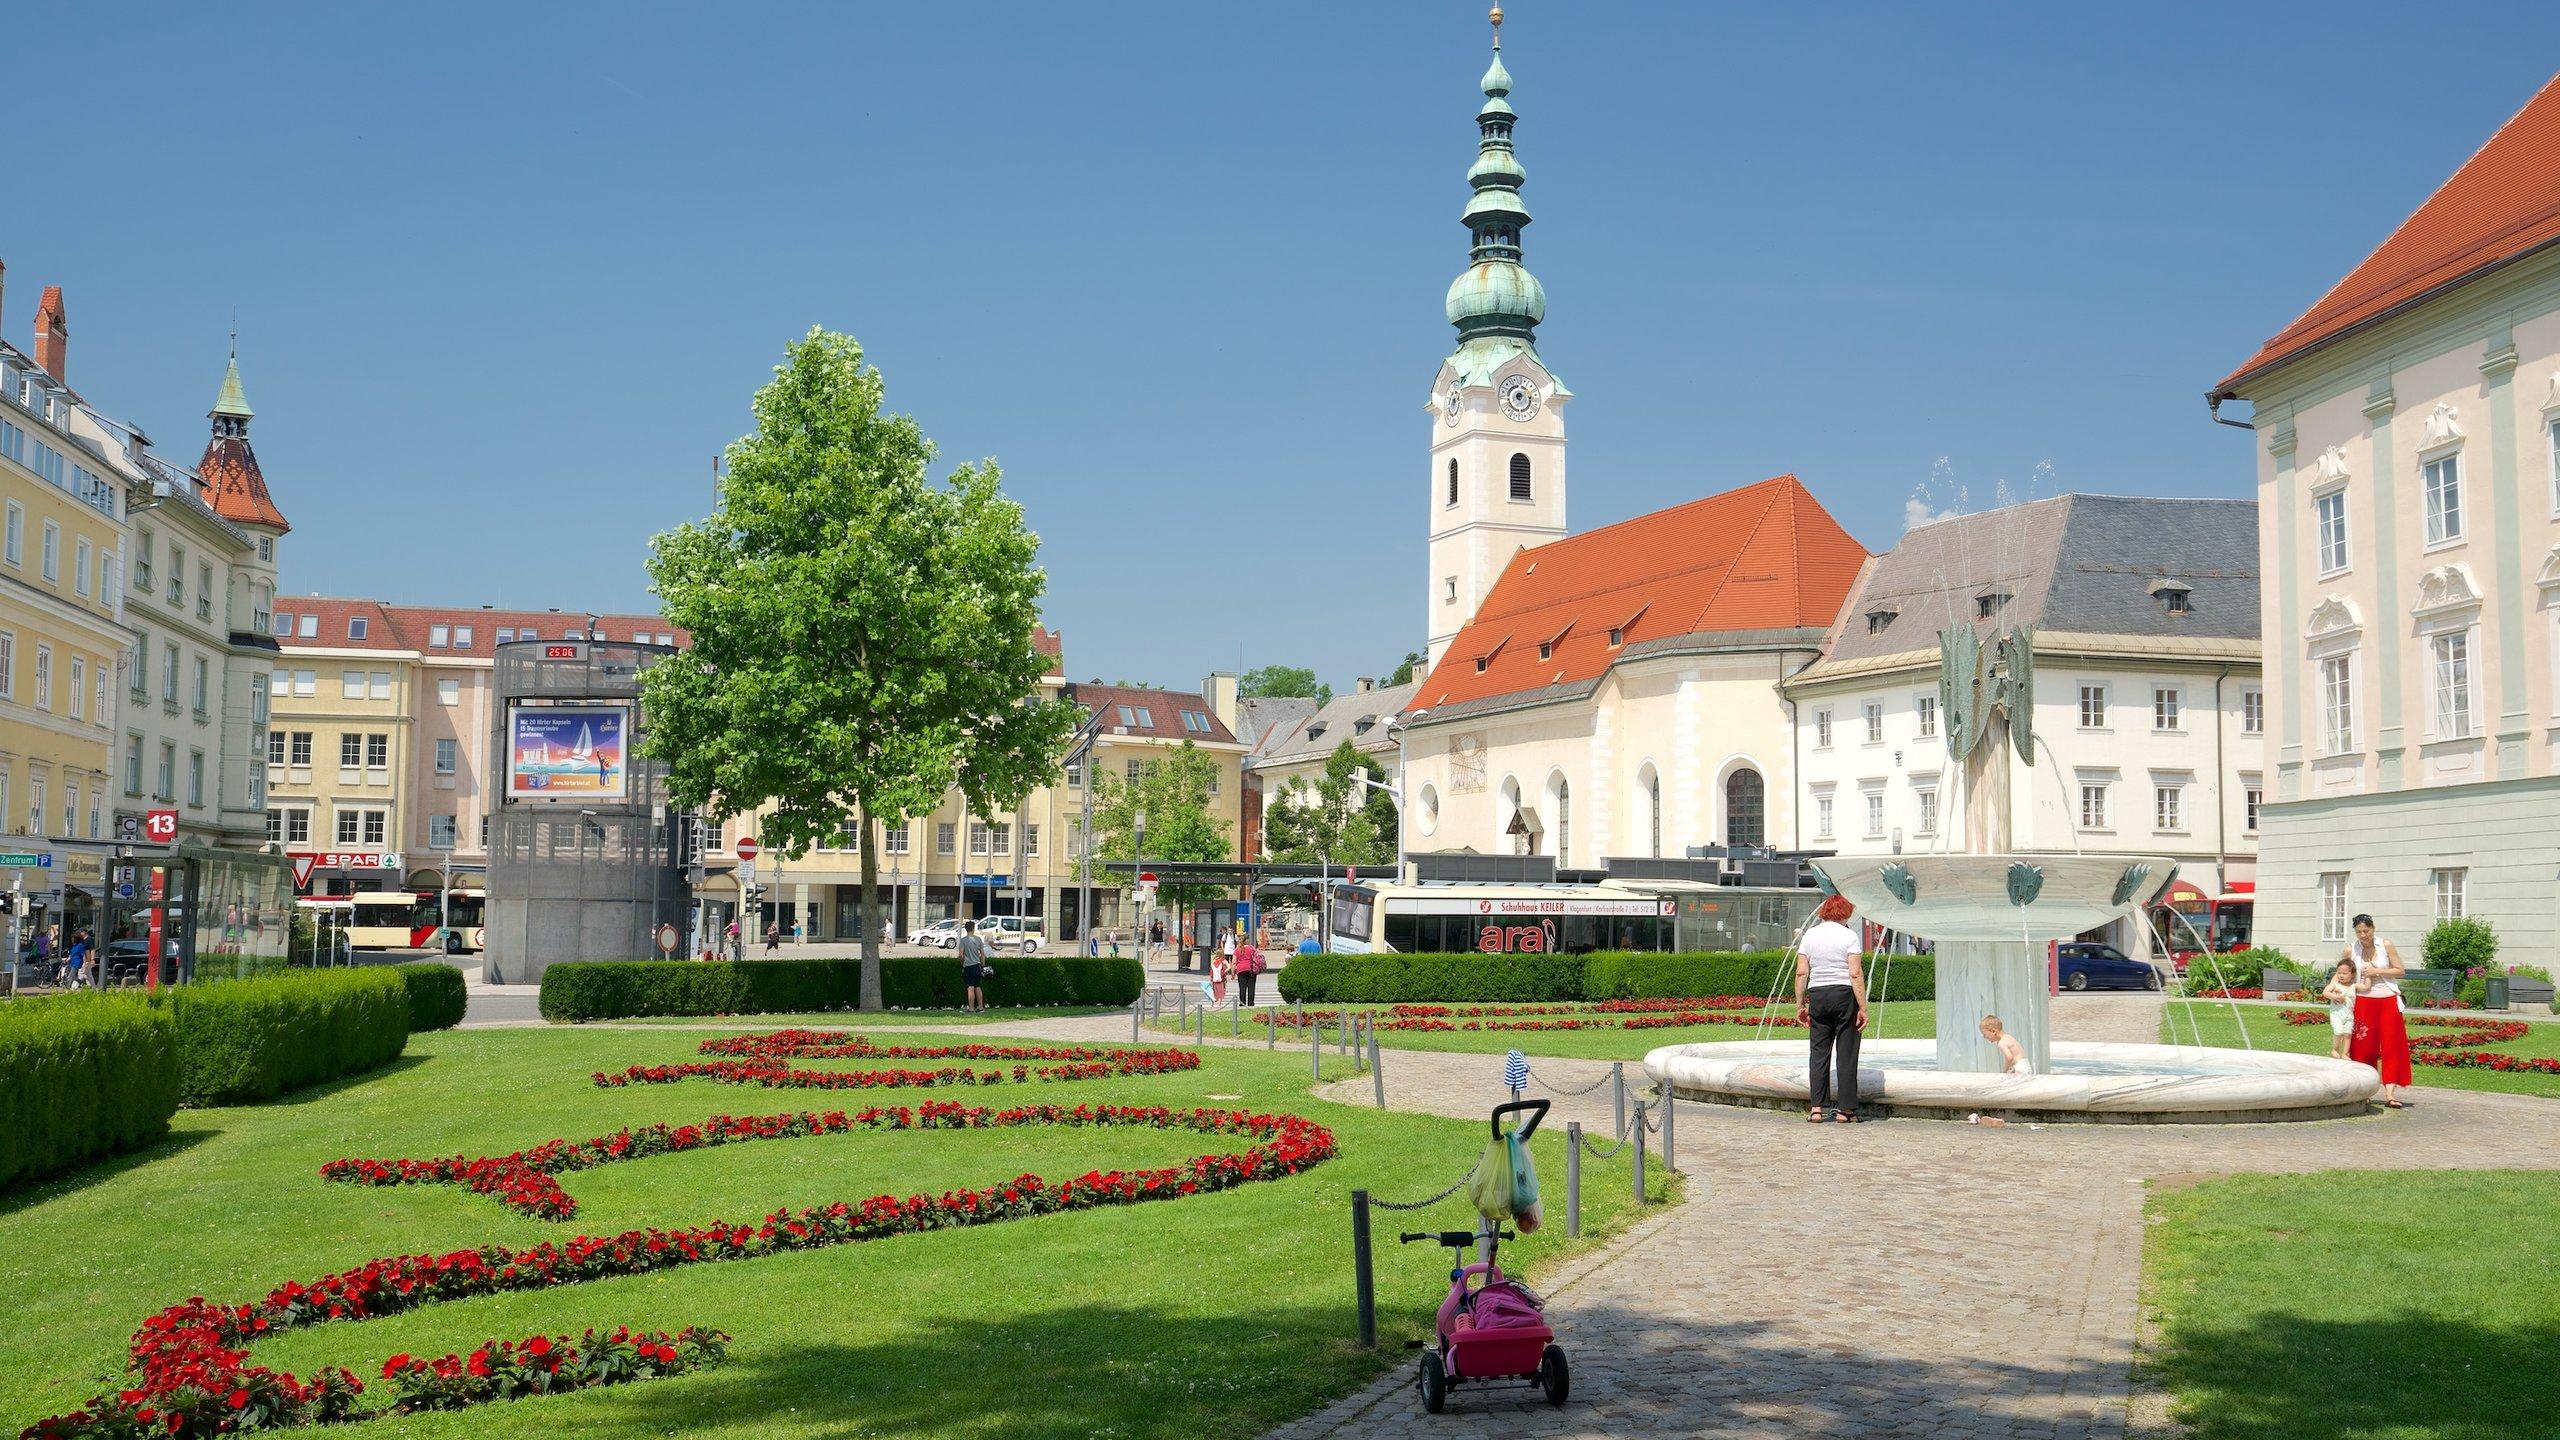 Klagenfurt am Woerthersee, Carinthia, Austria